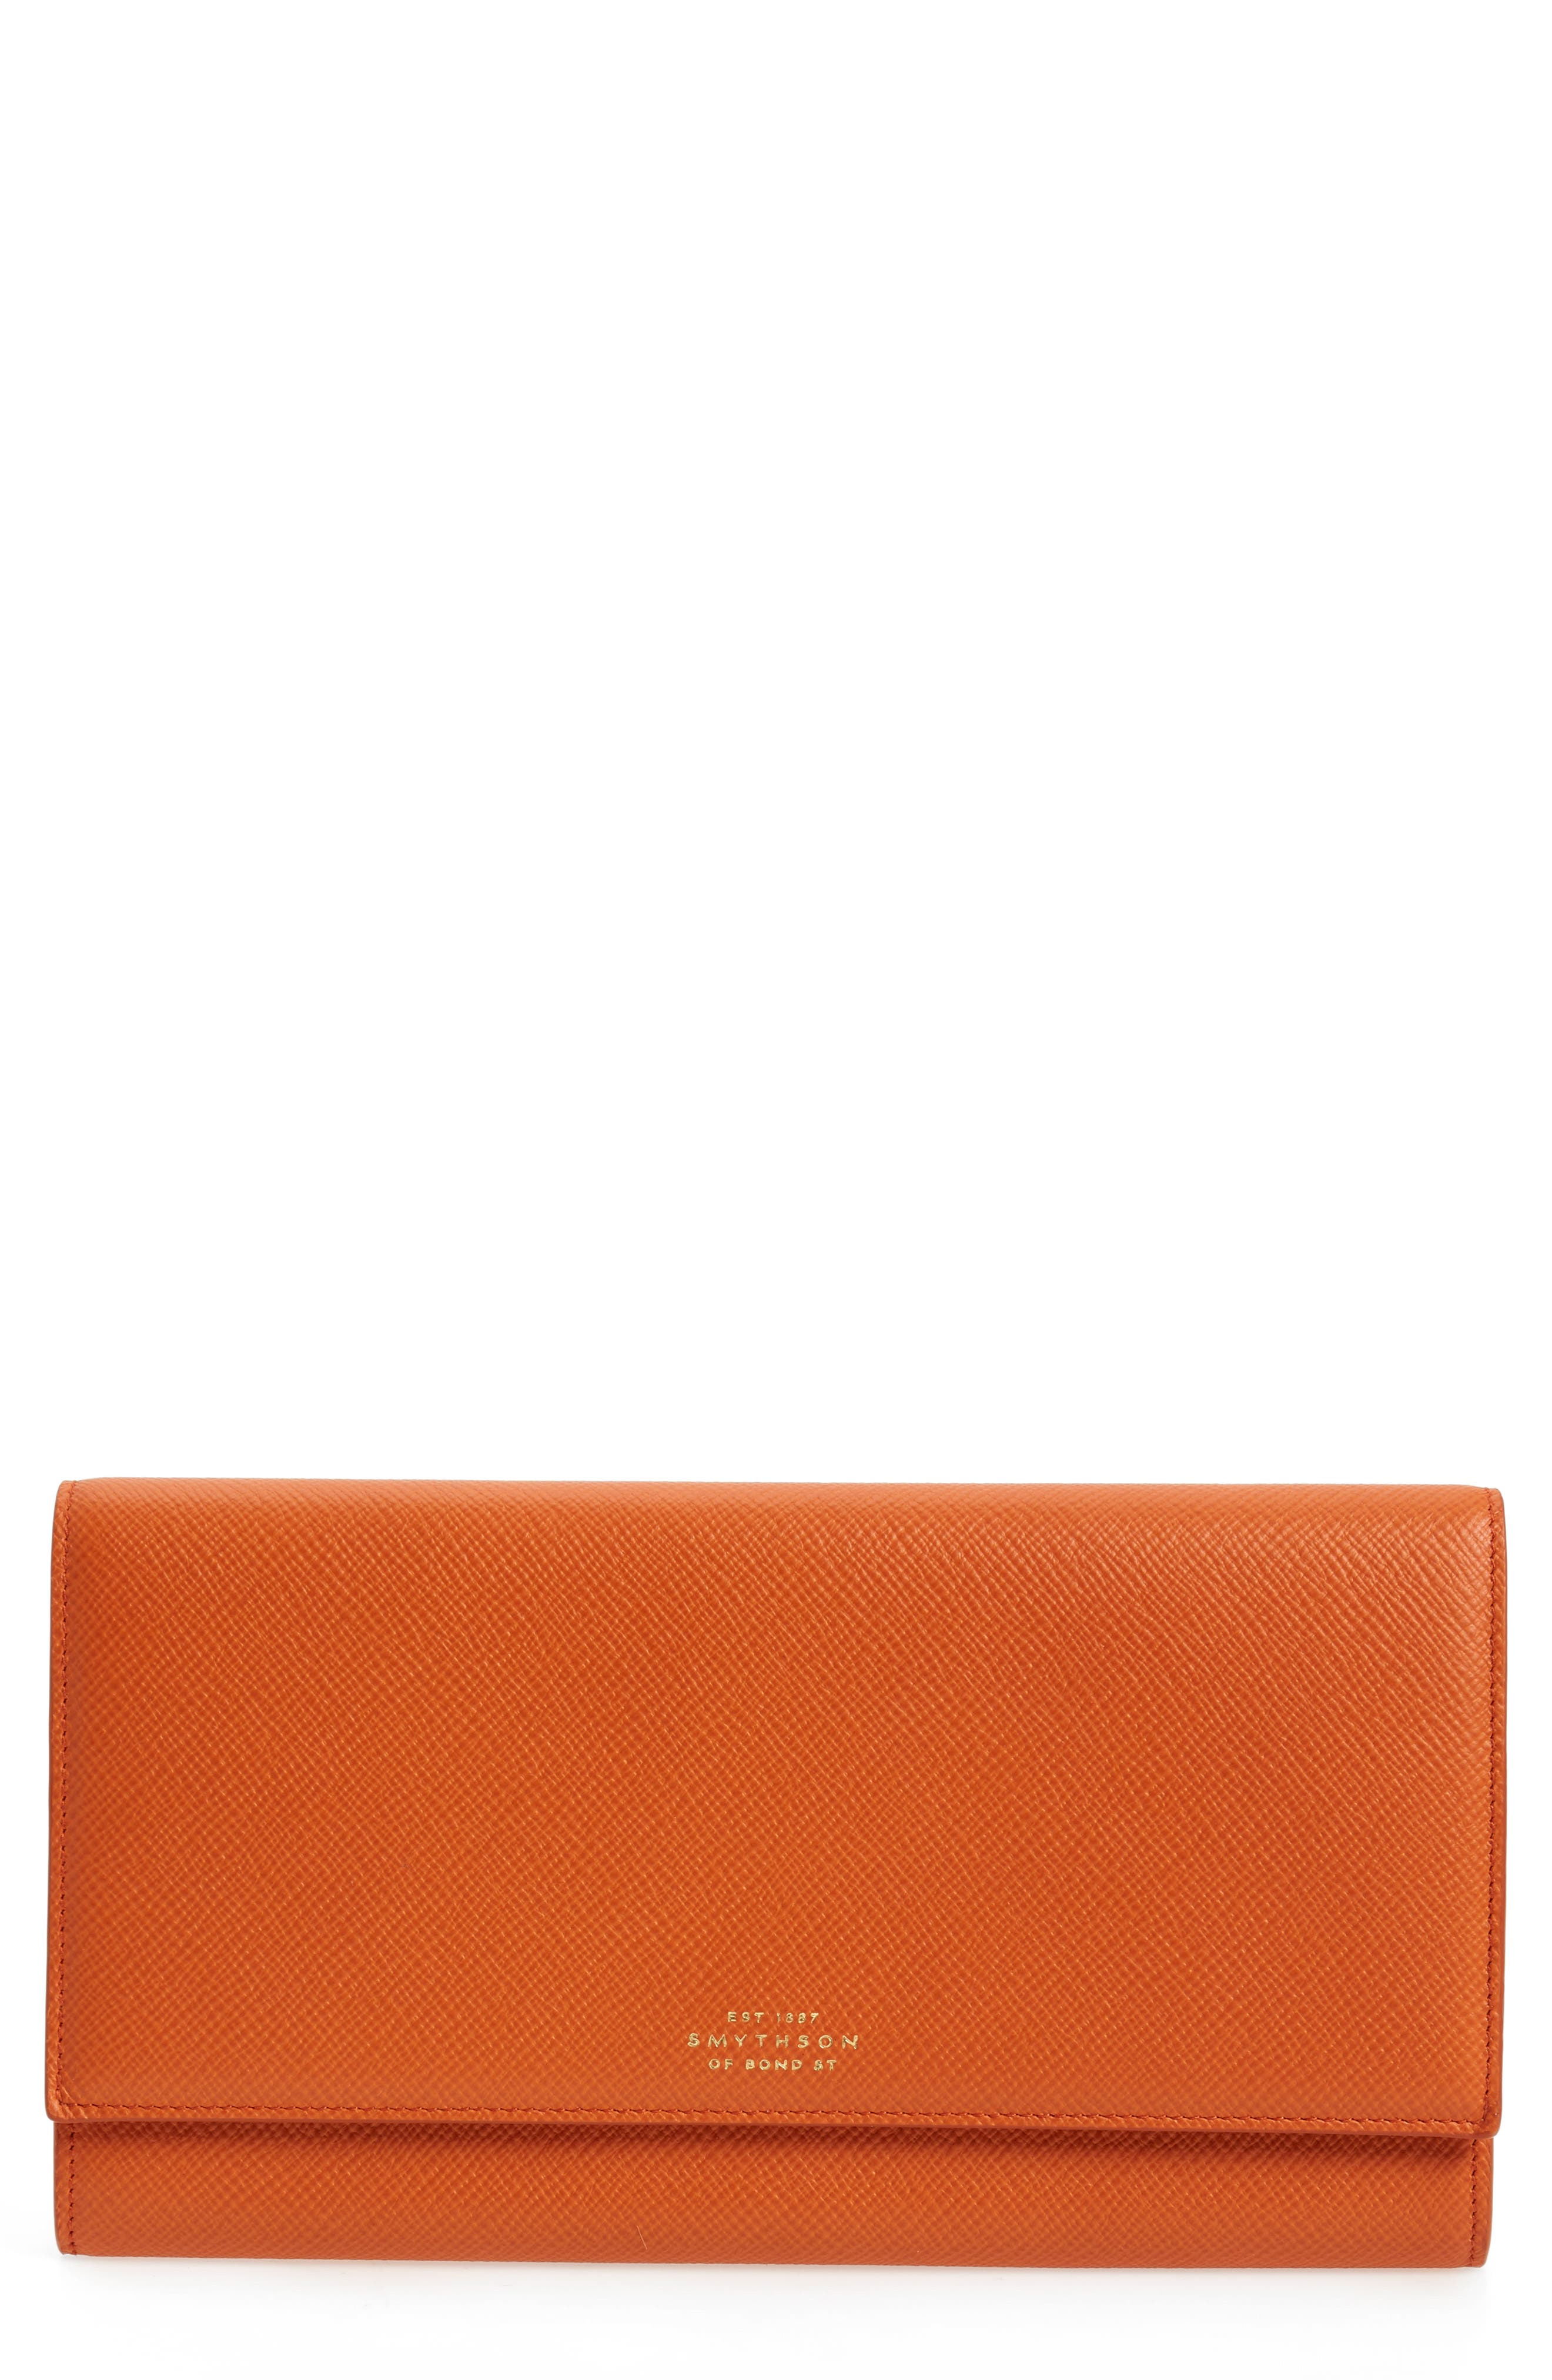 Panama Marshall Calfskin Leather Travel Wallet,                             Main thumbnail 1, color,                             800